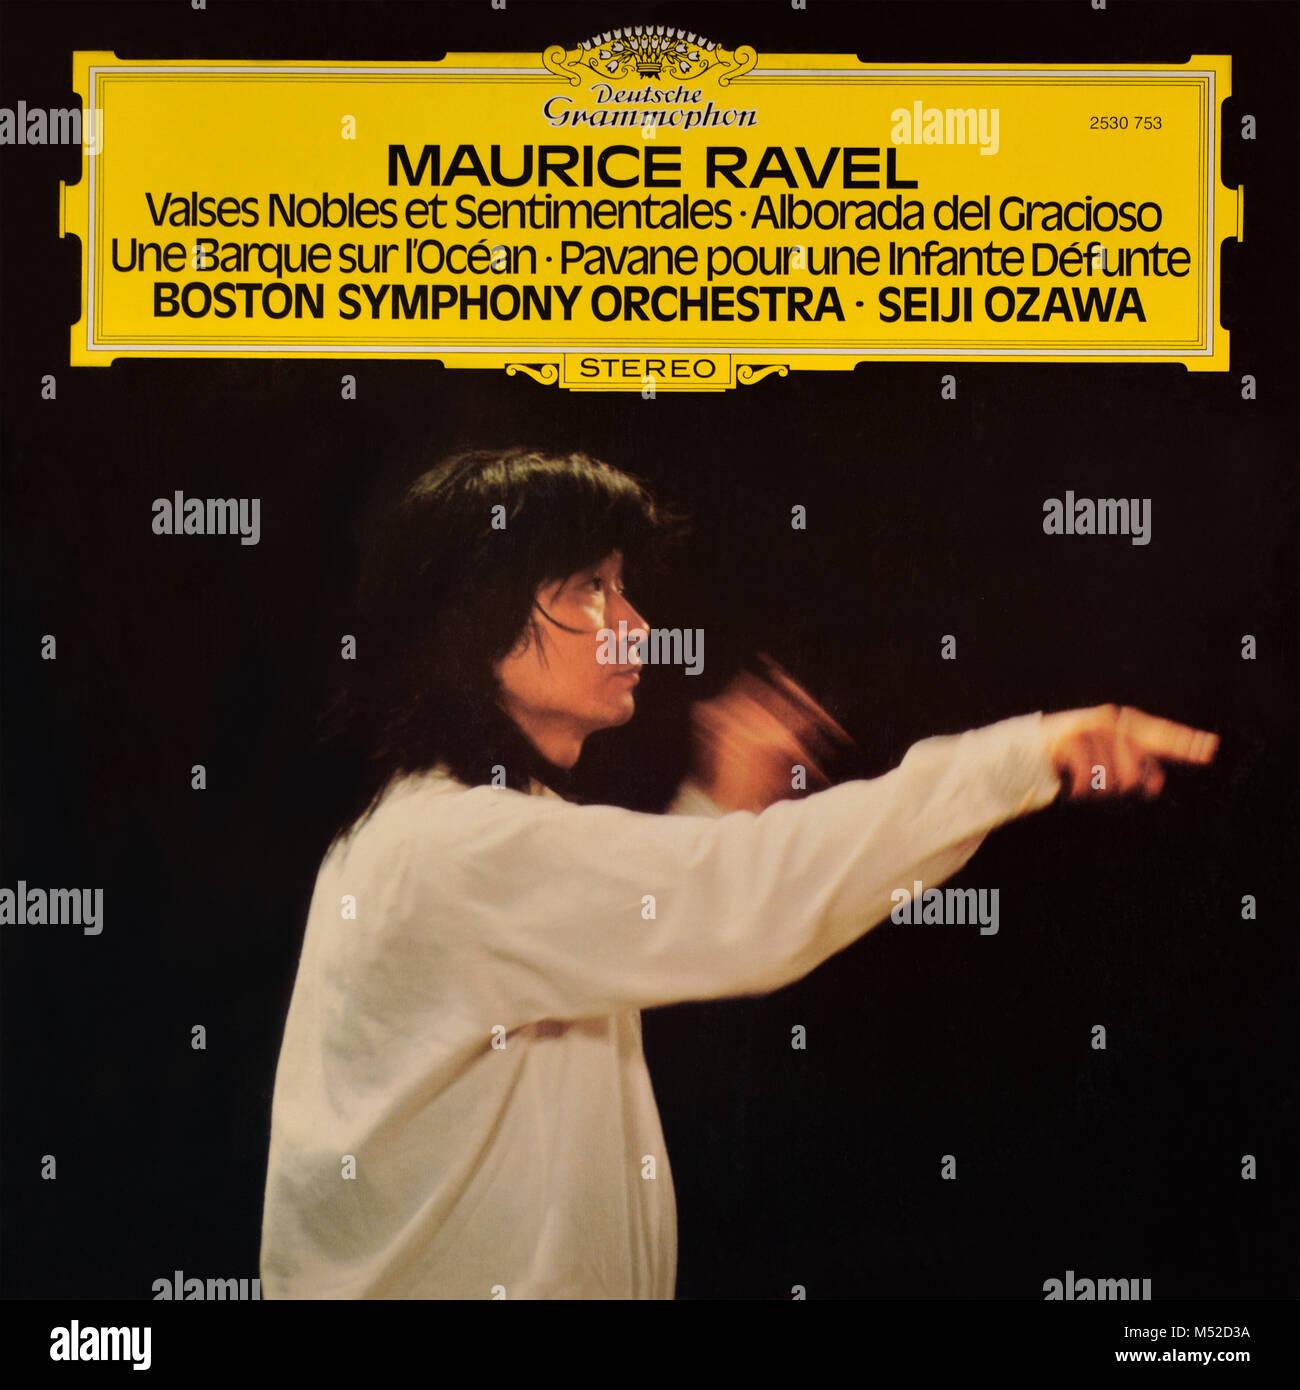 Maurice Ravel - Boston Symphony Orchestra • Seiji Ozawa original vinyl album cover - 1975 - Stock Image